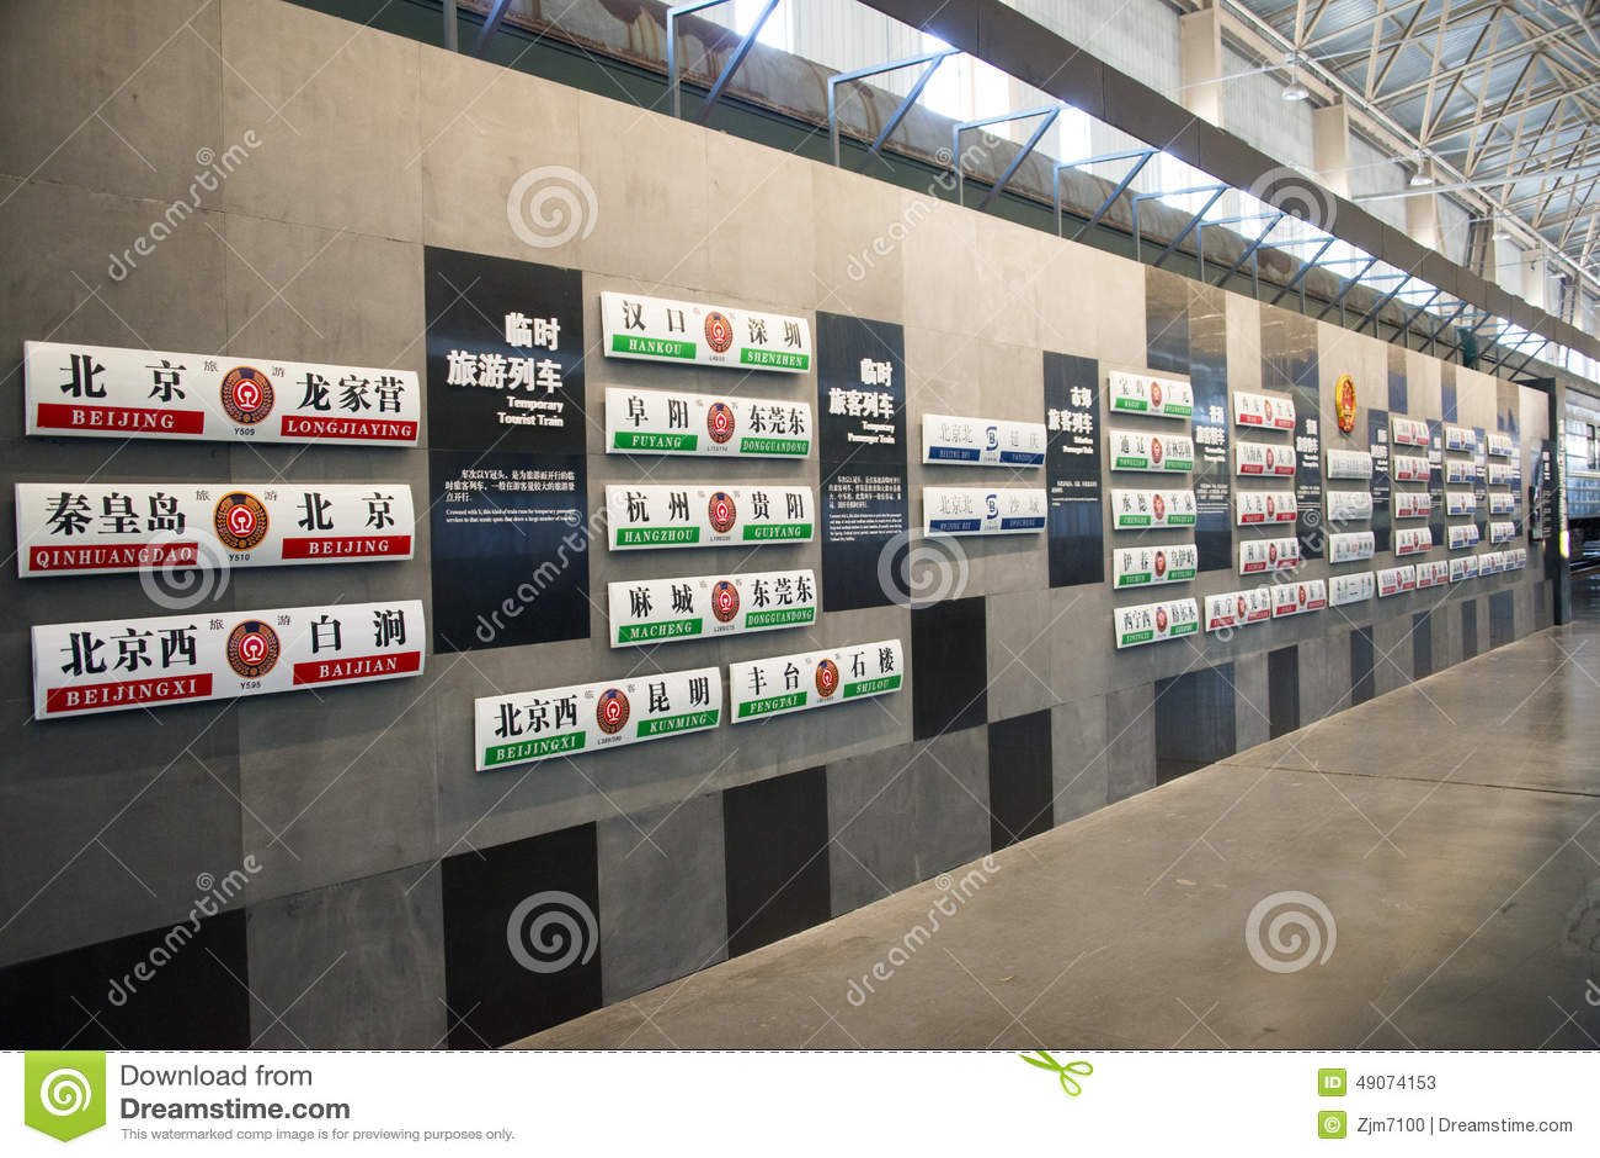 Asian rail exhibitions